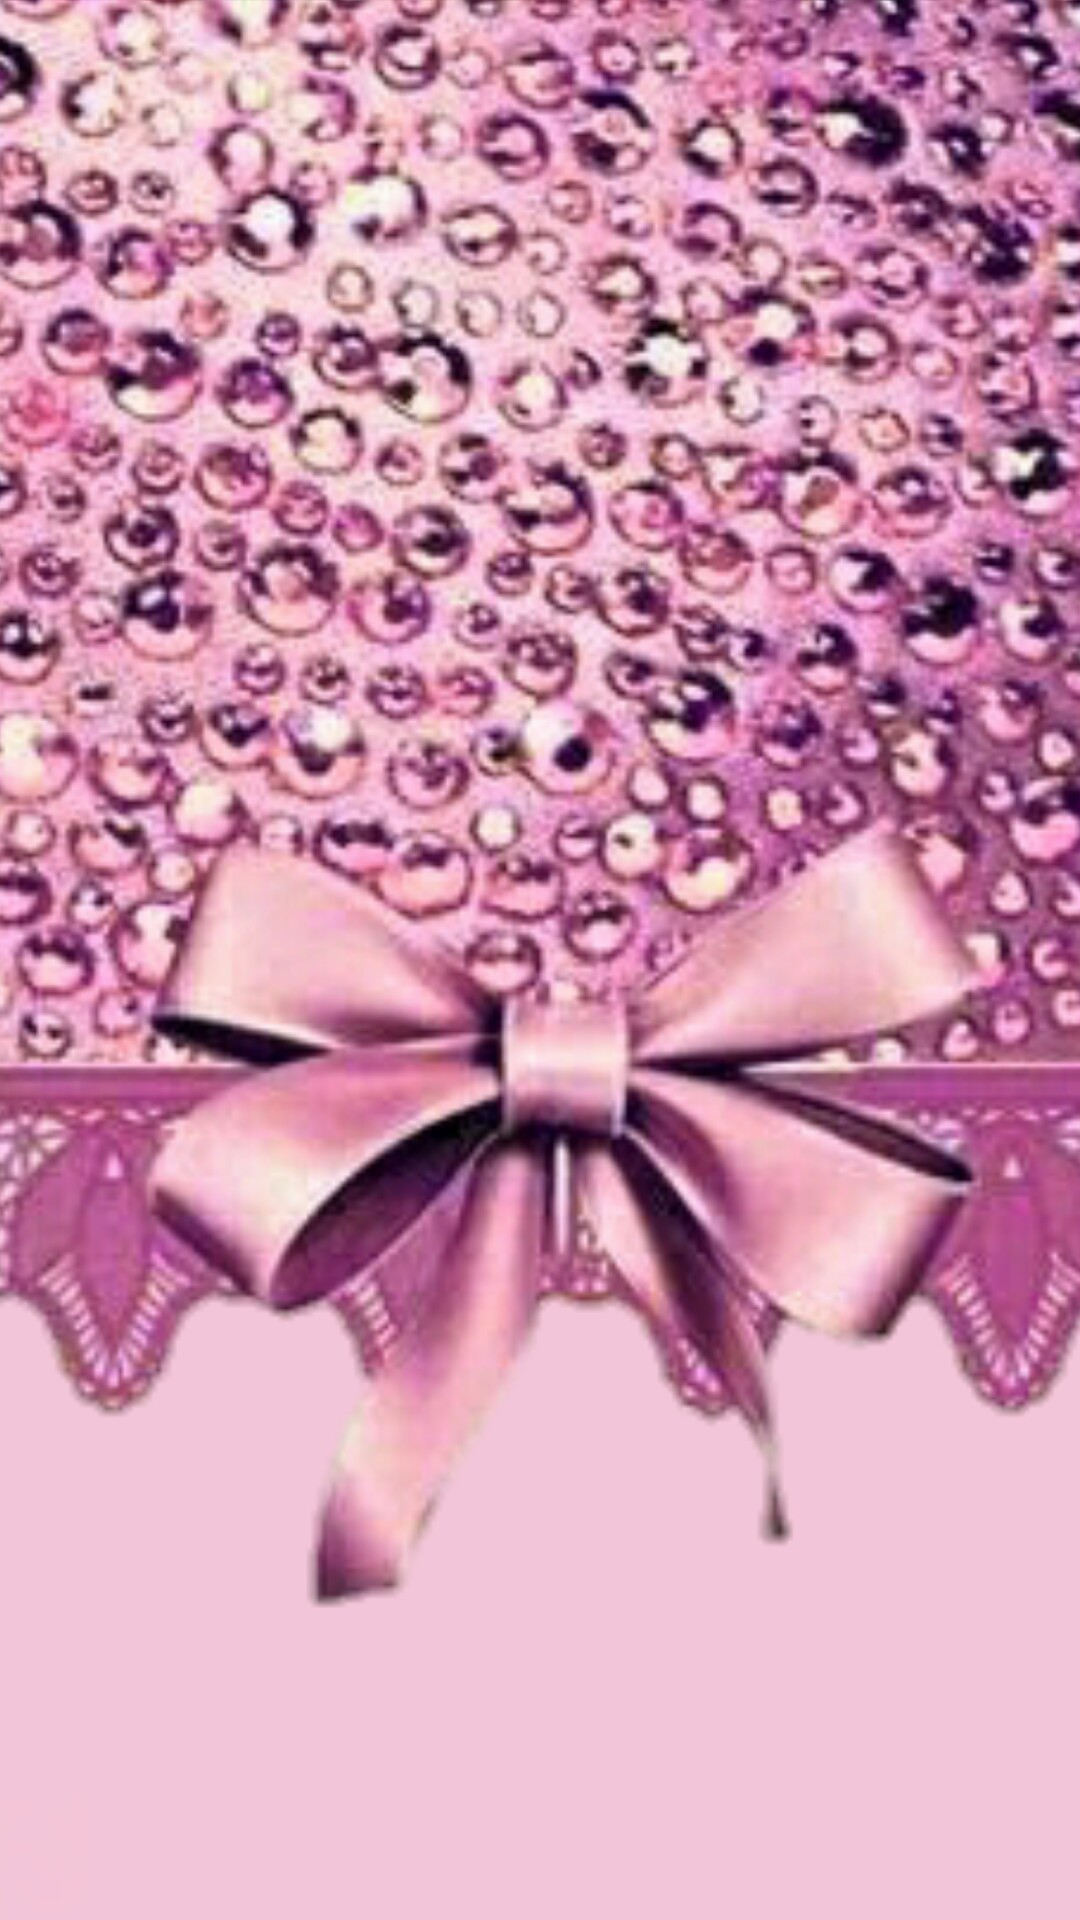 2998x1875 Freebie Friday Designer Nerd Desktop Wallpaper